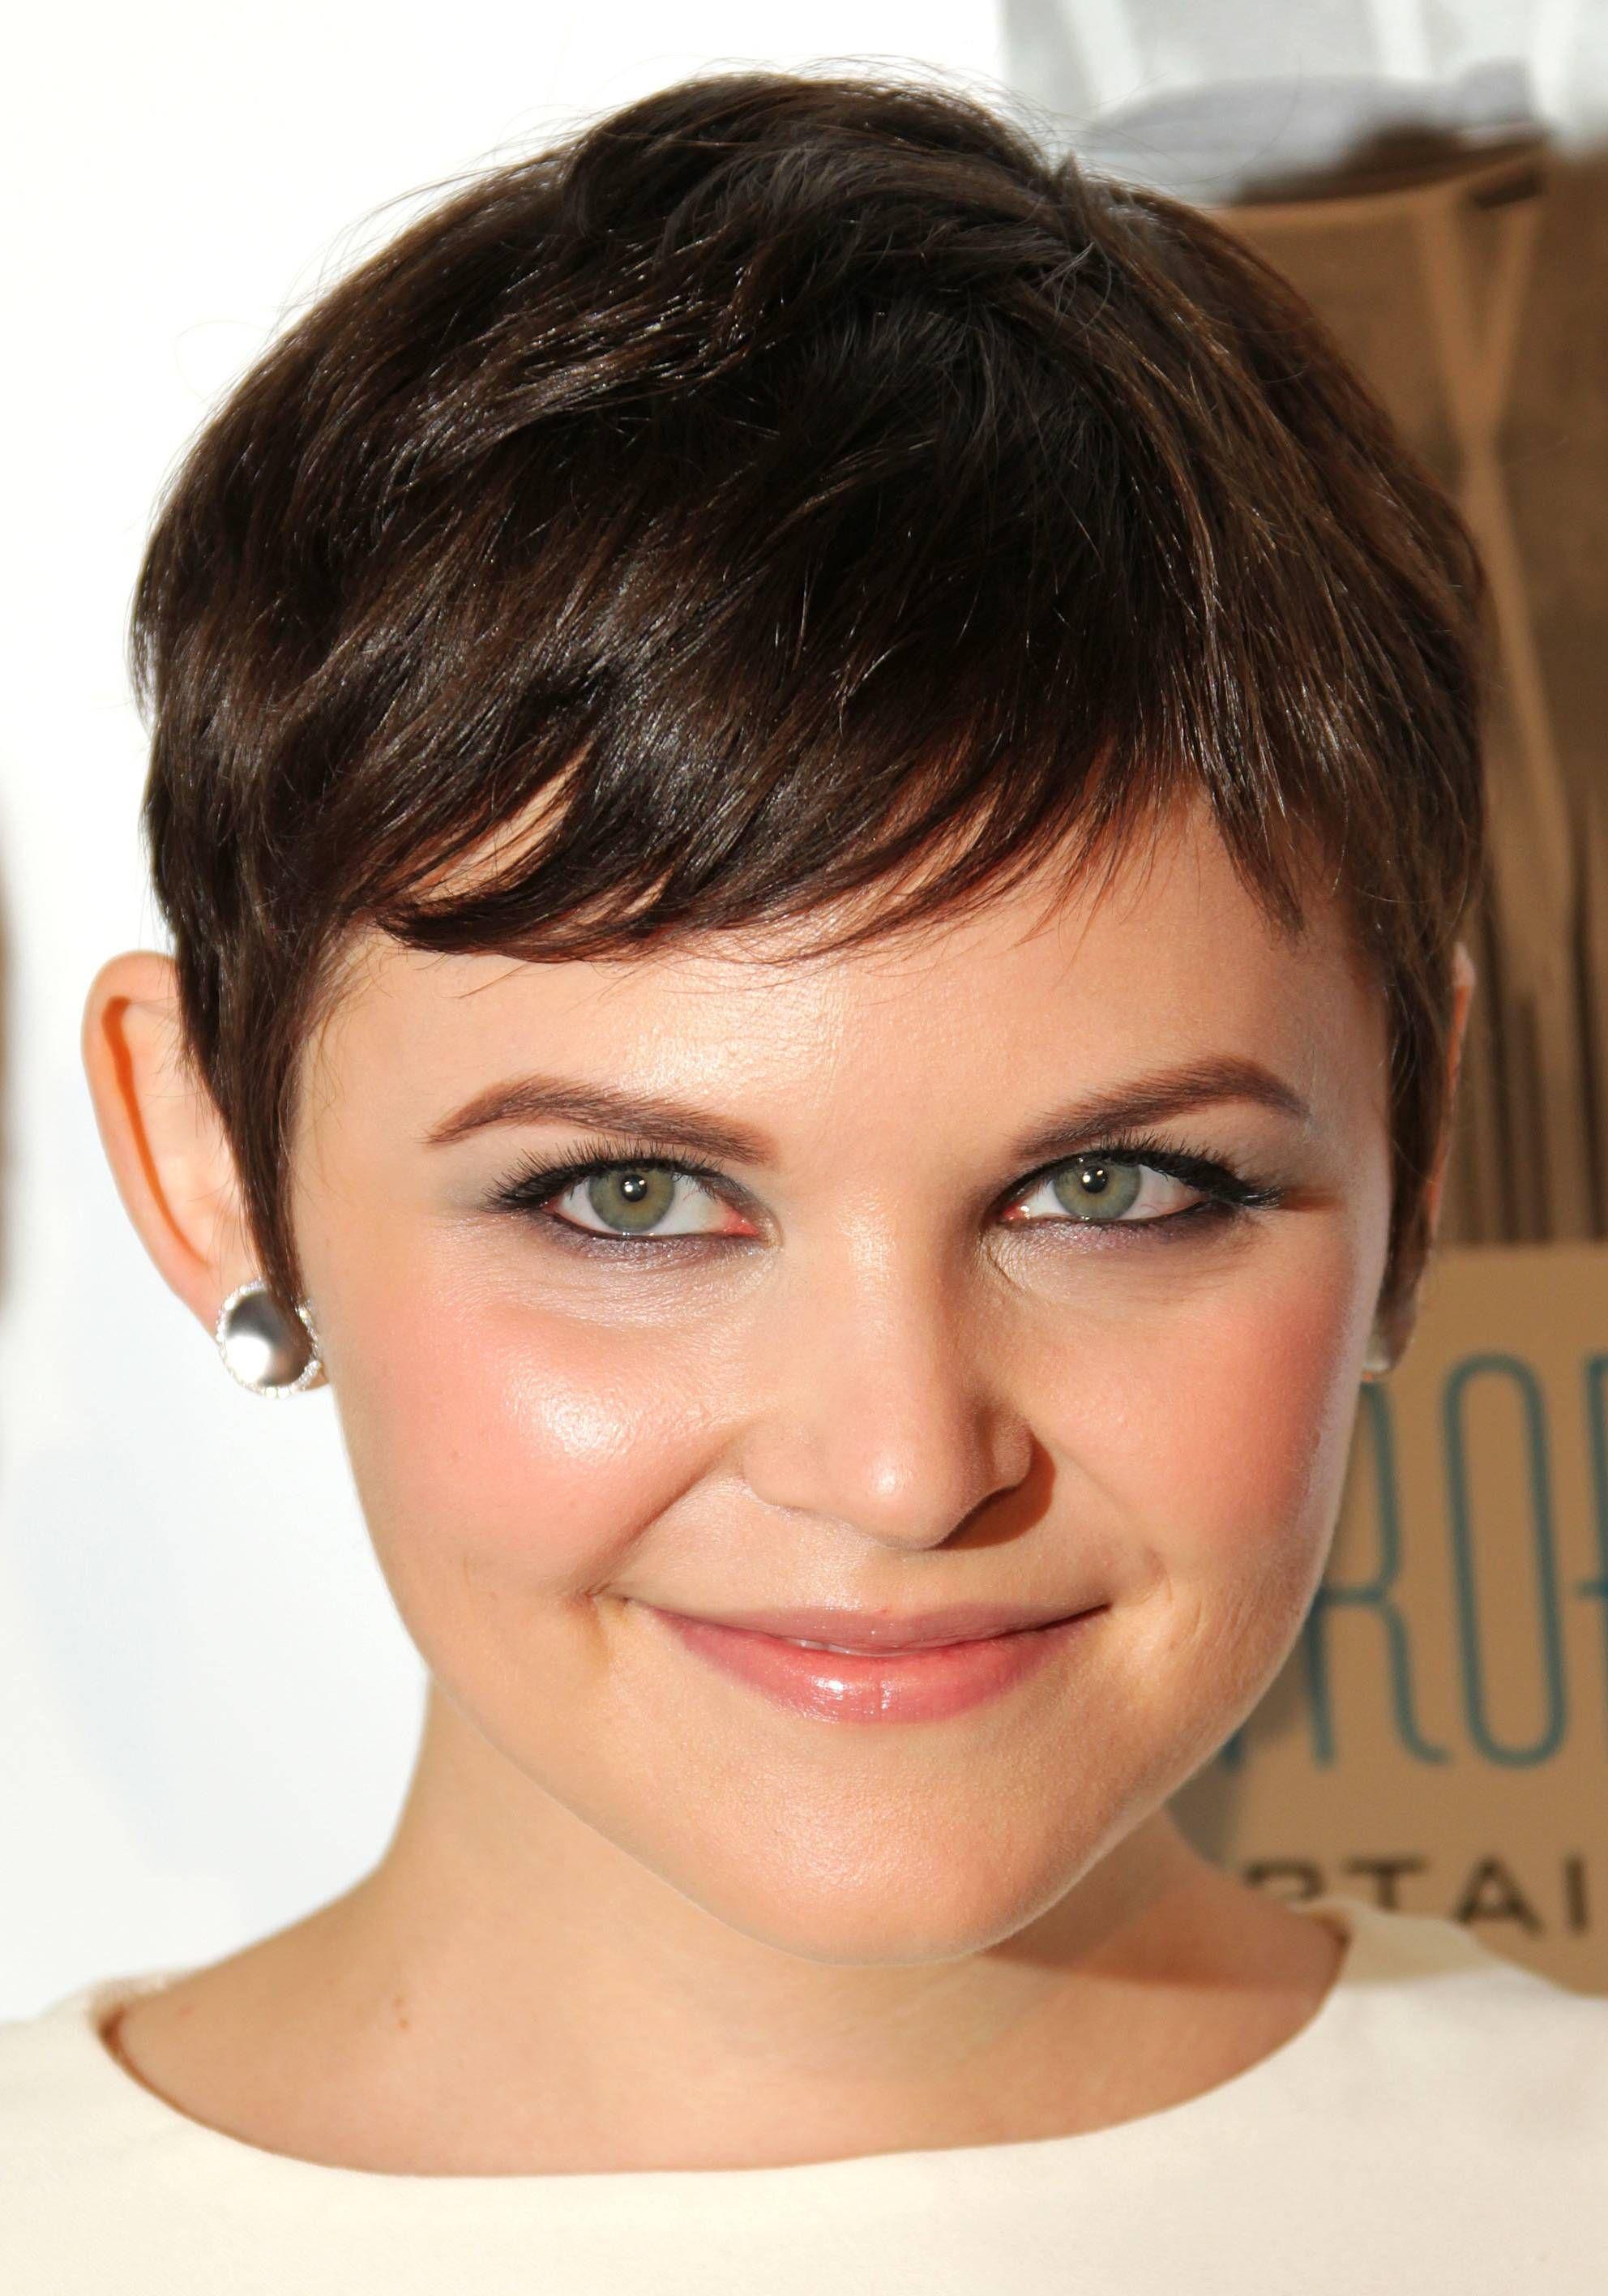 Terrific 1000 Images About Pixie Cut On Pinterest Short Hairstyles Short Hairstyles Gunalazisus